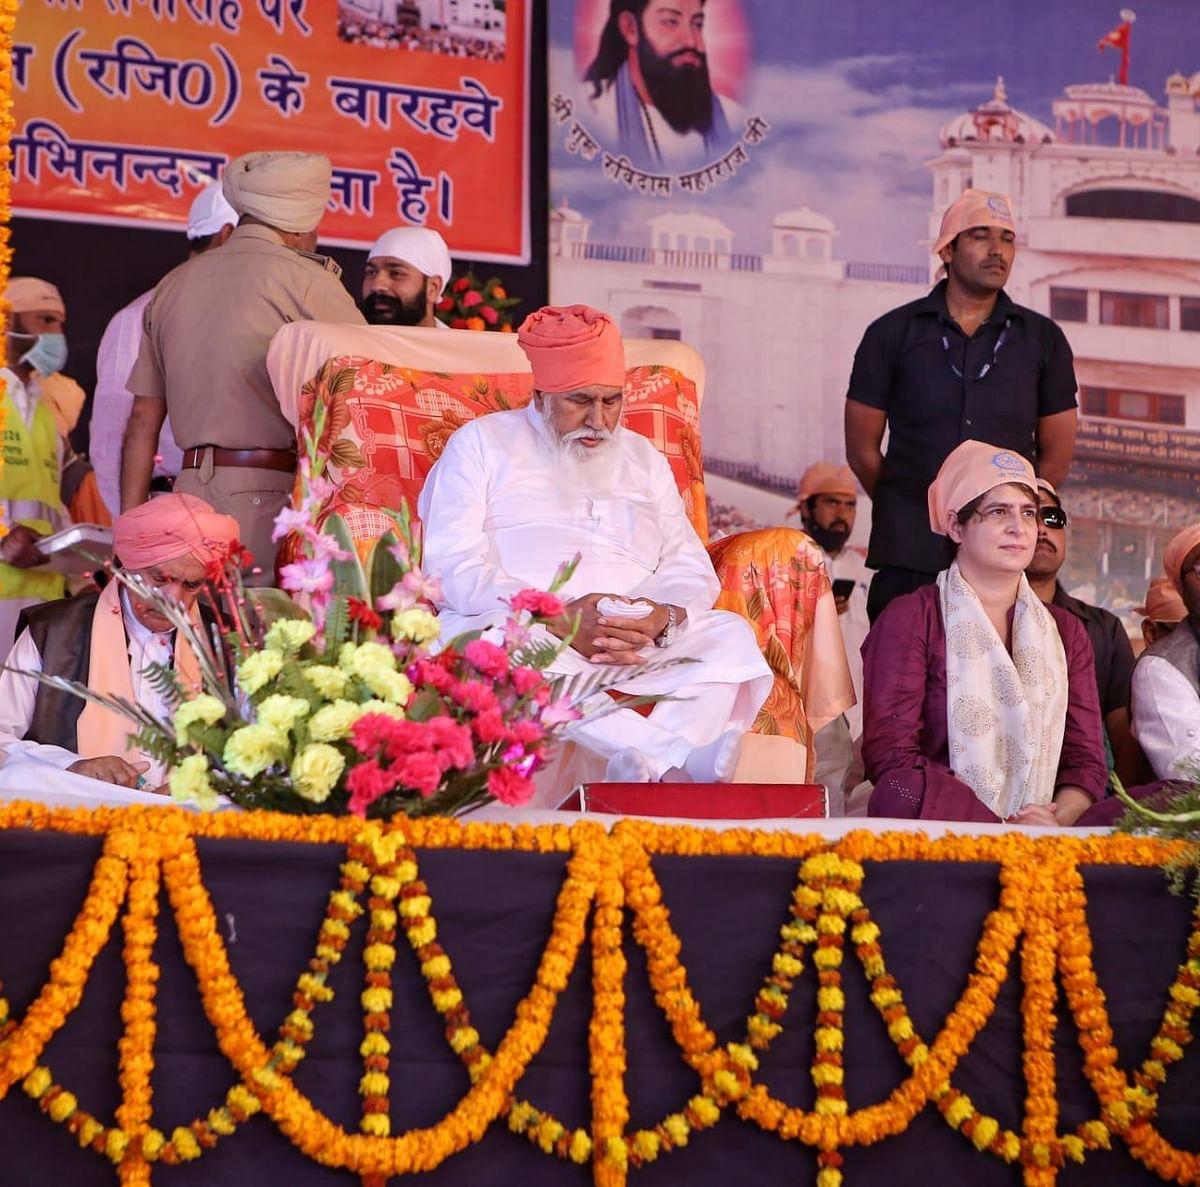 priyanka-gandhi-took-obeisance-in-front-of-the-statue-of-sant-ravidas-took-blessings-from-saints